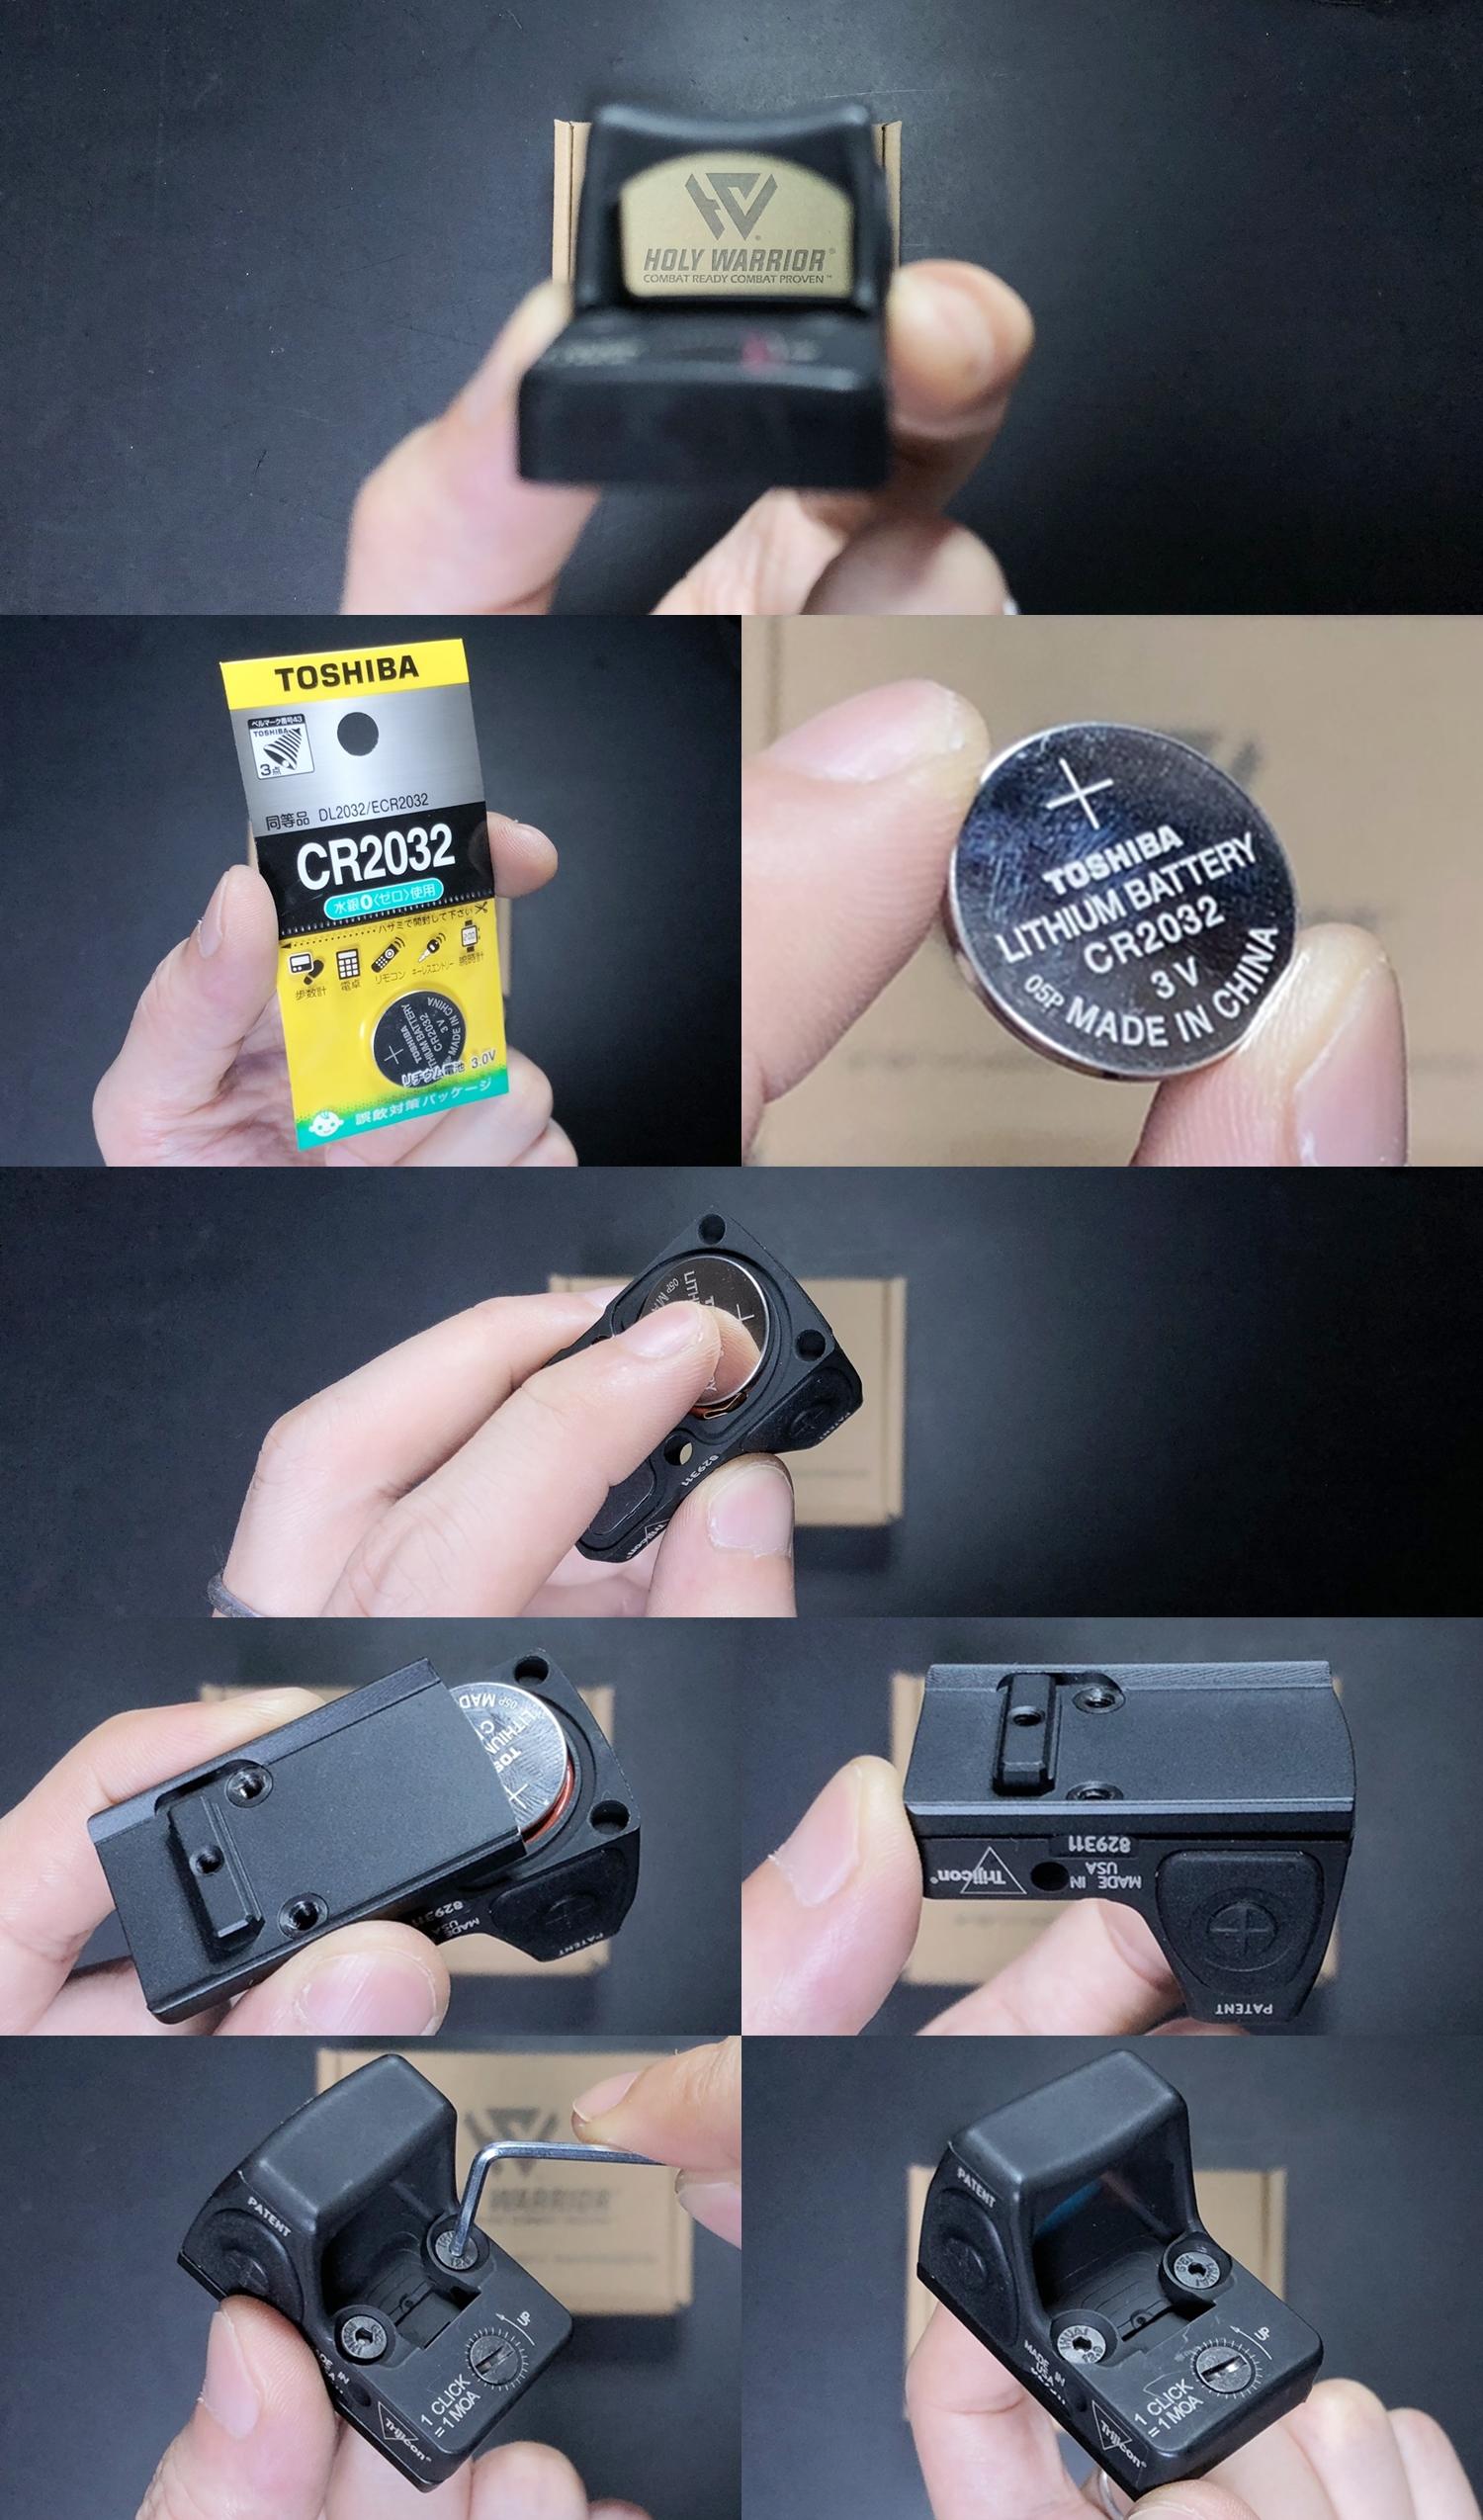 5 HolyWarrior製 RMR Trijicon Type ドットサイト GET!! 噂のHW製 最新 超軽量 複合材質 樹脂 タイプを購入したけど速攻で仲間に奪われました(笑)!! Glock G17 GBB カスタム!! 購入 開封 取付 加工 レビュー!!